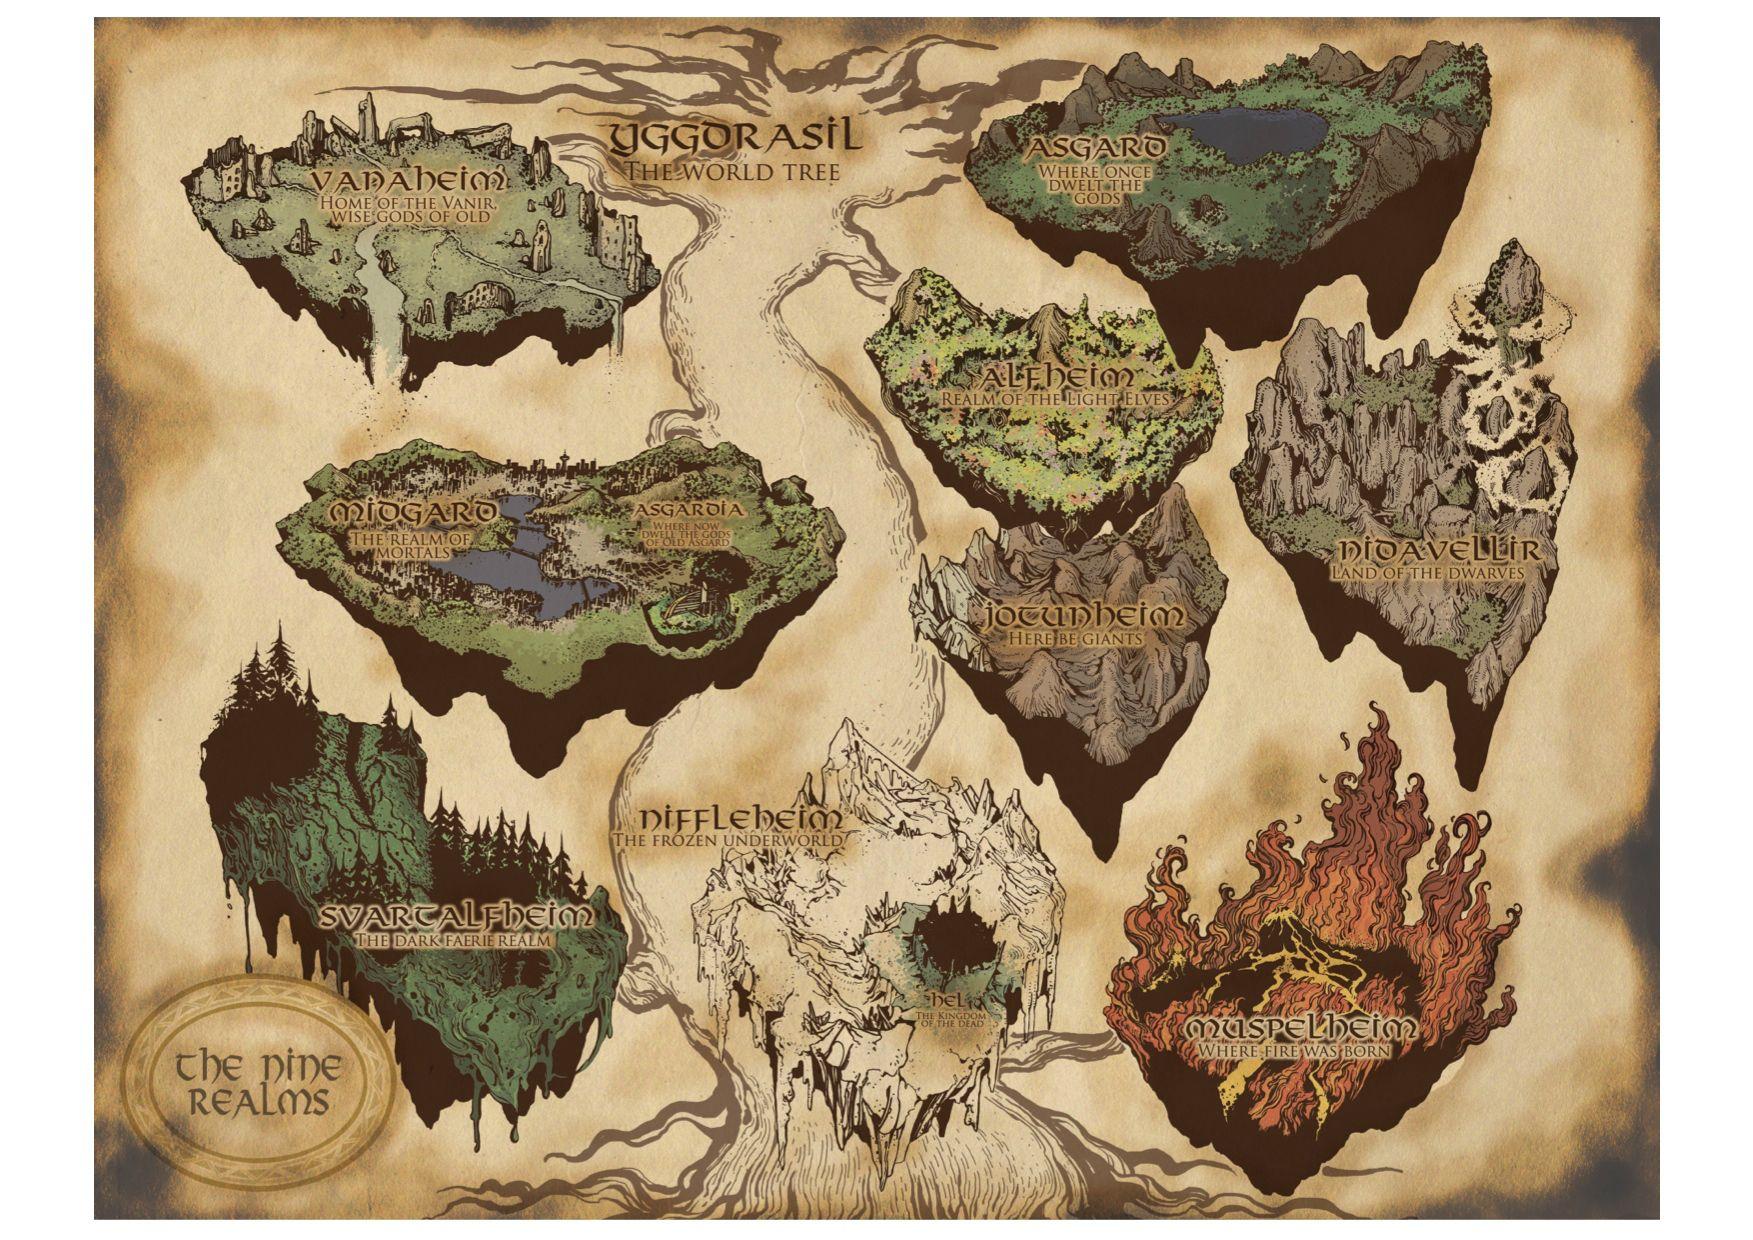 The Nine Worlds of Yggdrasil - Imgur